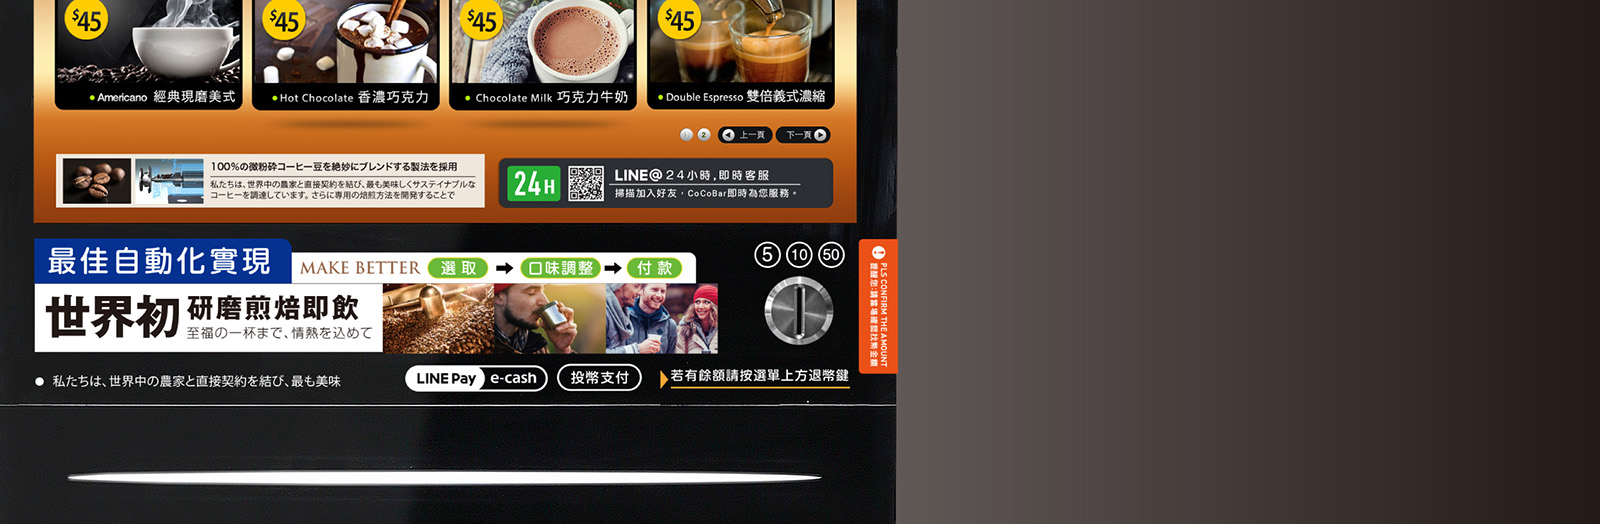 CoCoCafe無人咖啡機租賃-現金支付方案-banner